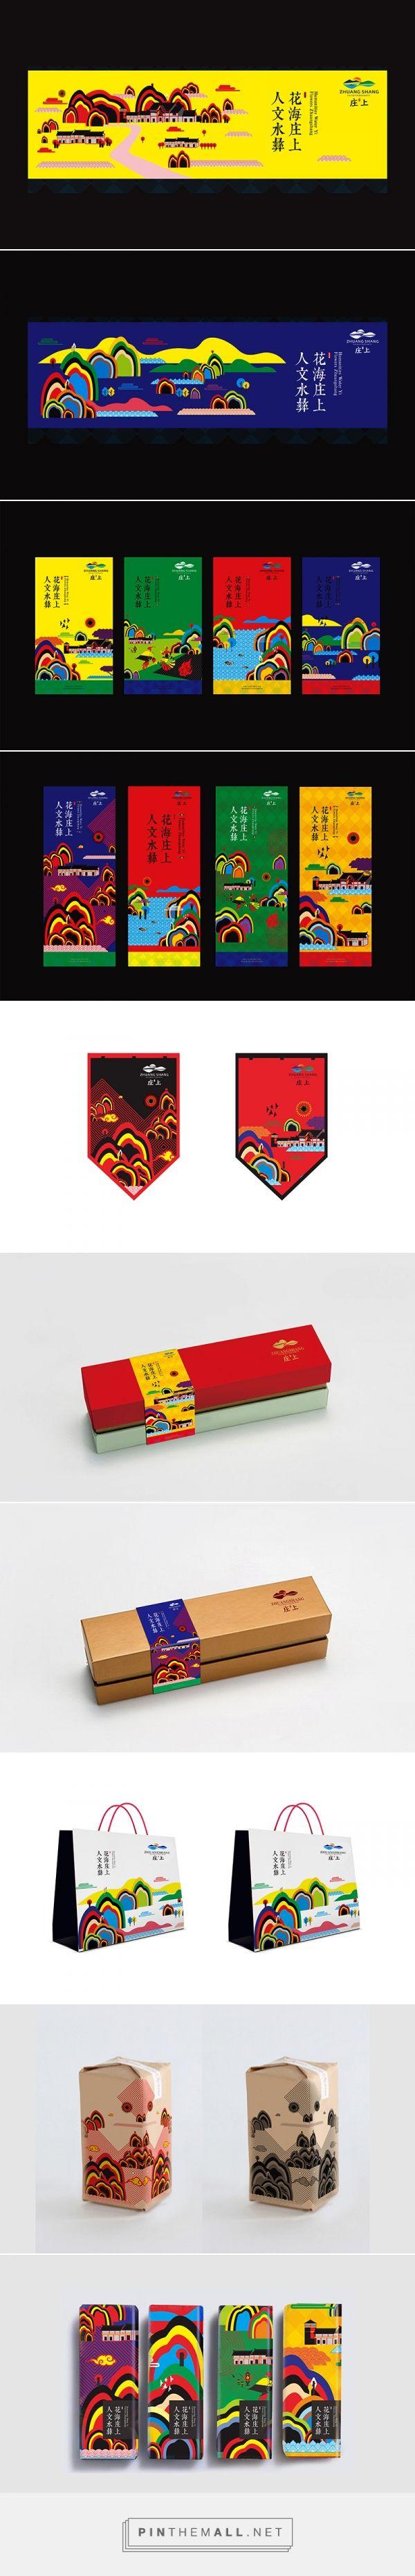 ■■B&D彼安迪设计2014下半年作品,平面/ 品牌 /VI/logo标志/导视/包装|VI/CI|平面|彼安迪设计 - 原创设计作品 - 站酷 (ZCOOL) curated by Packaging Diva PD. love this colorful packaging